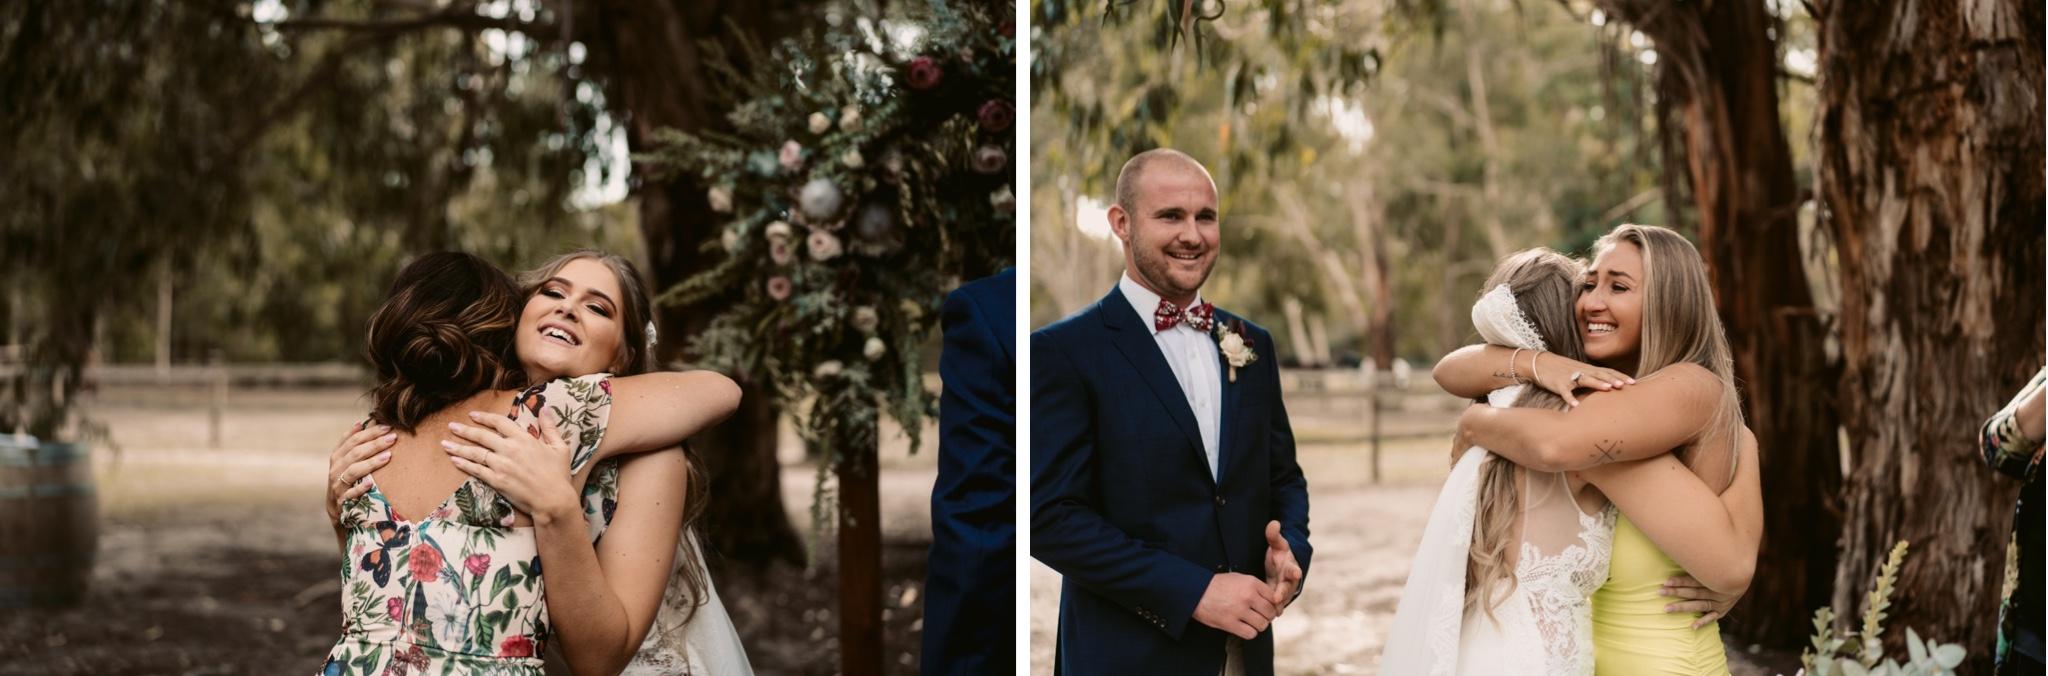 Mornington Peninsula Wedding Photography57.jpg